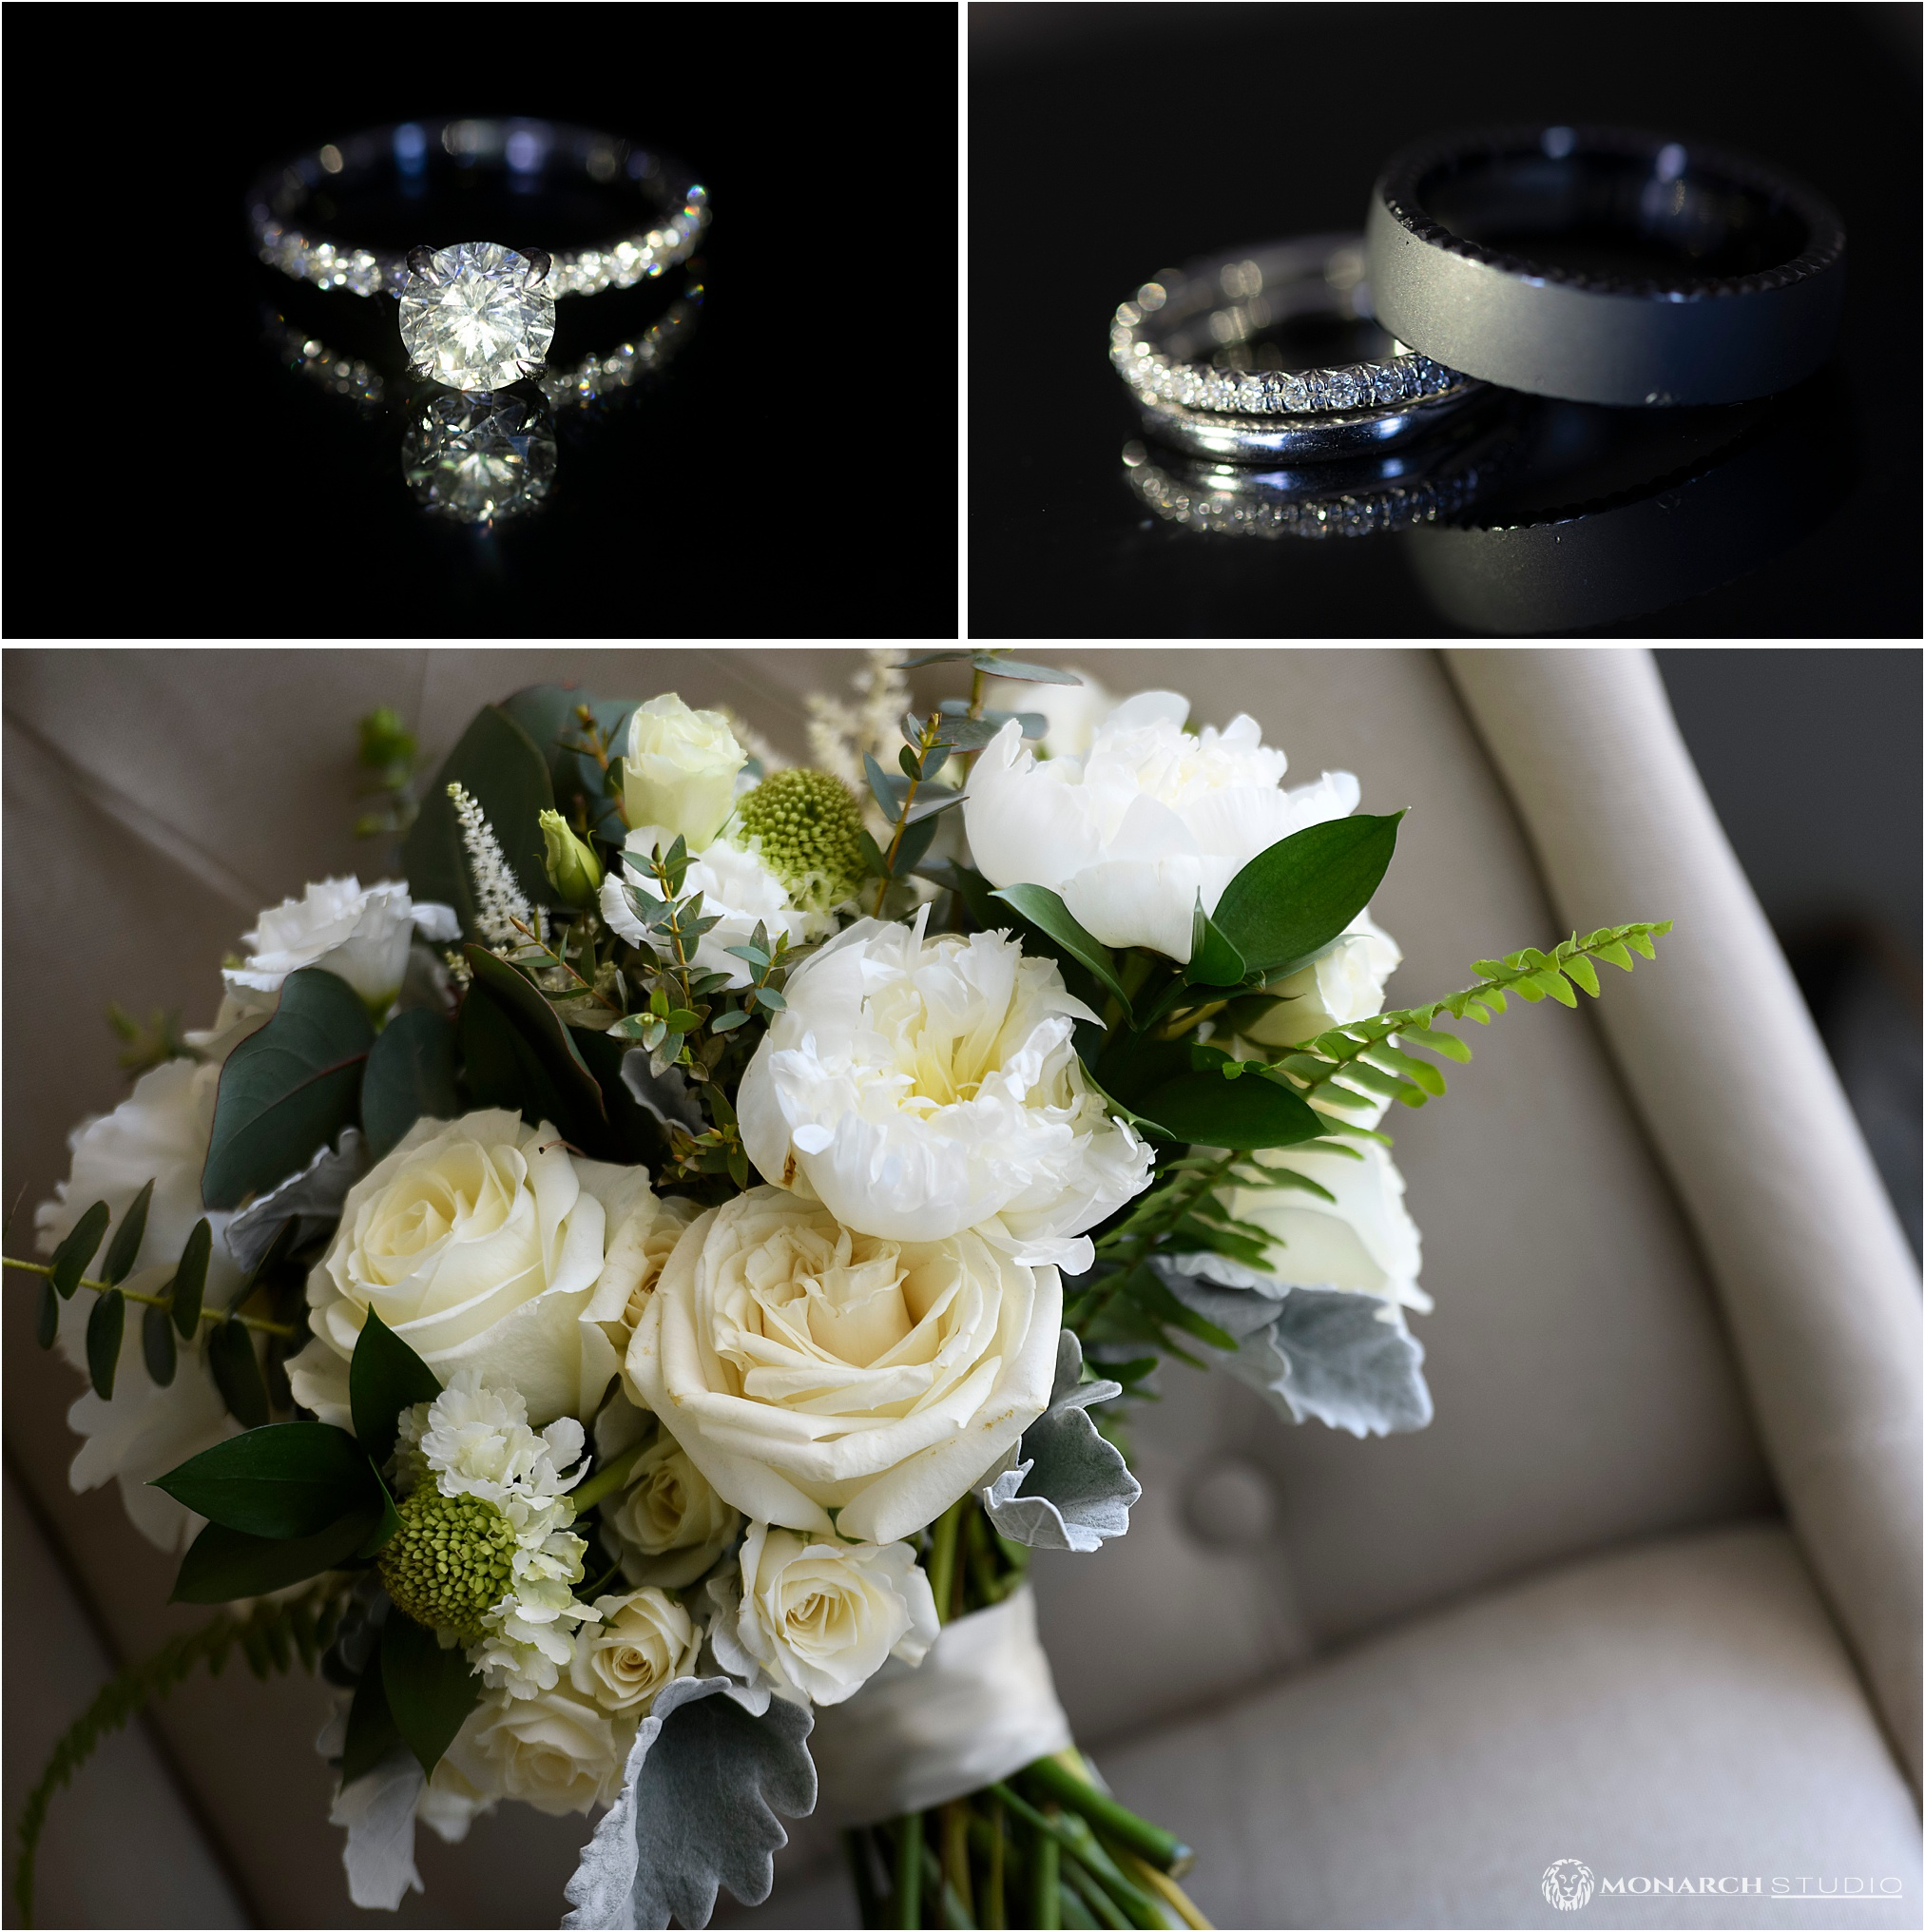 024-whiteroom-wedding-photographer-2019-05-22_0006.jpg